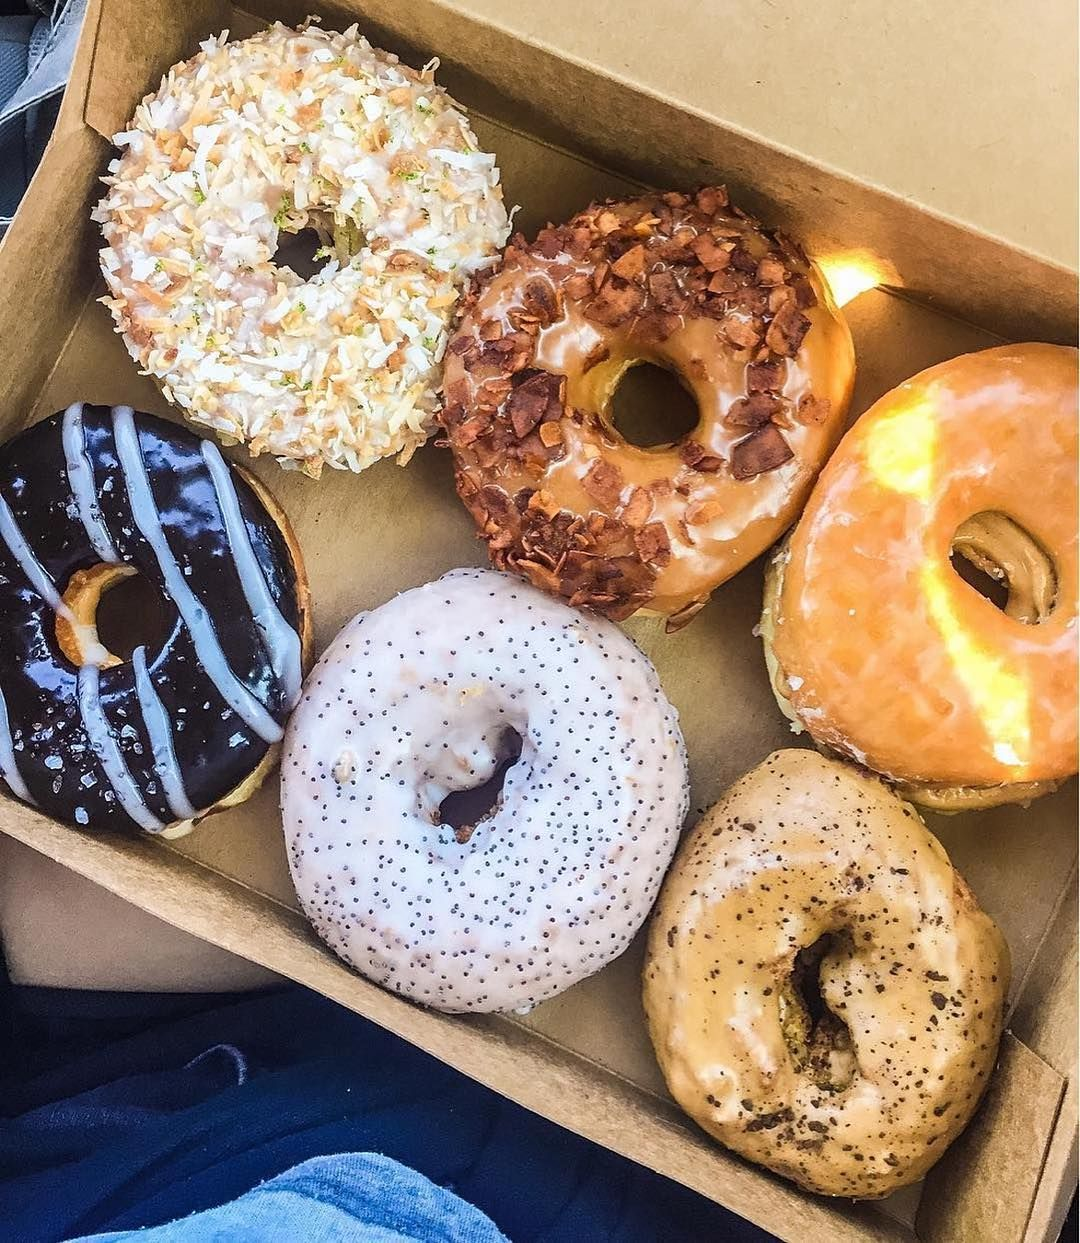 Vegan Donuts From Donut Friend Los Angeles Vegan Cake Foodie Fun Donut Friend